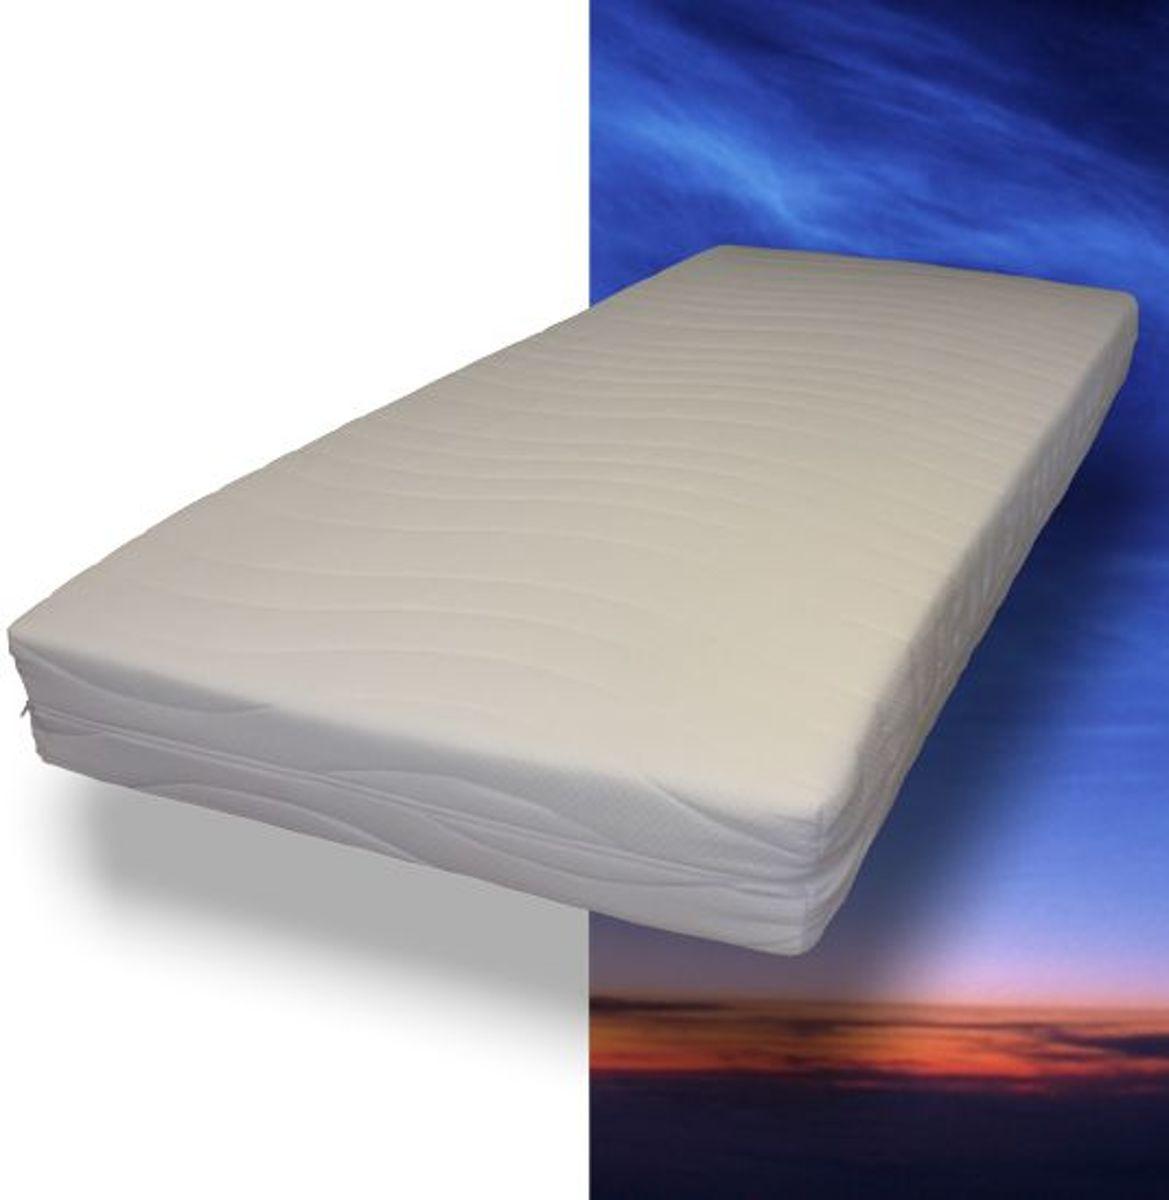 MAH - Pocketvering matras met koudschuim - 130 x 200 x 21 cm - Medium